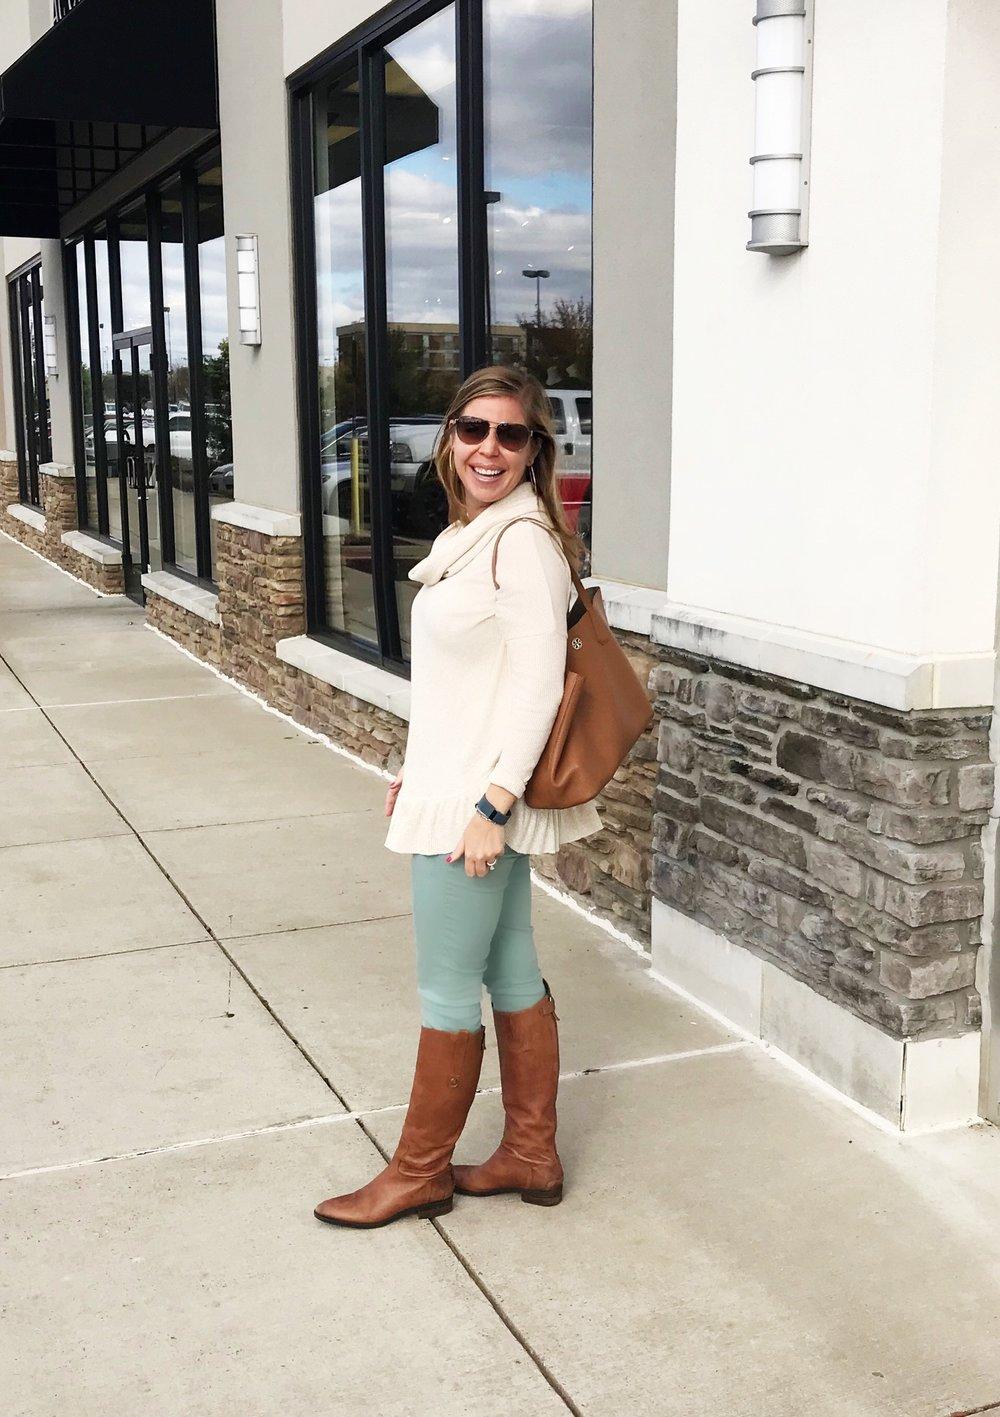 Sweater  //  Similar Jeans  //  Boots  //  Similar Handbag  //  Sunglasses